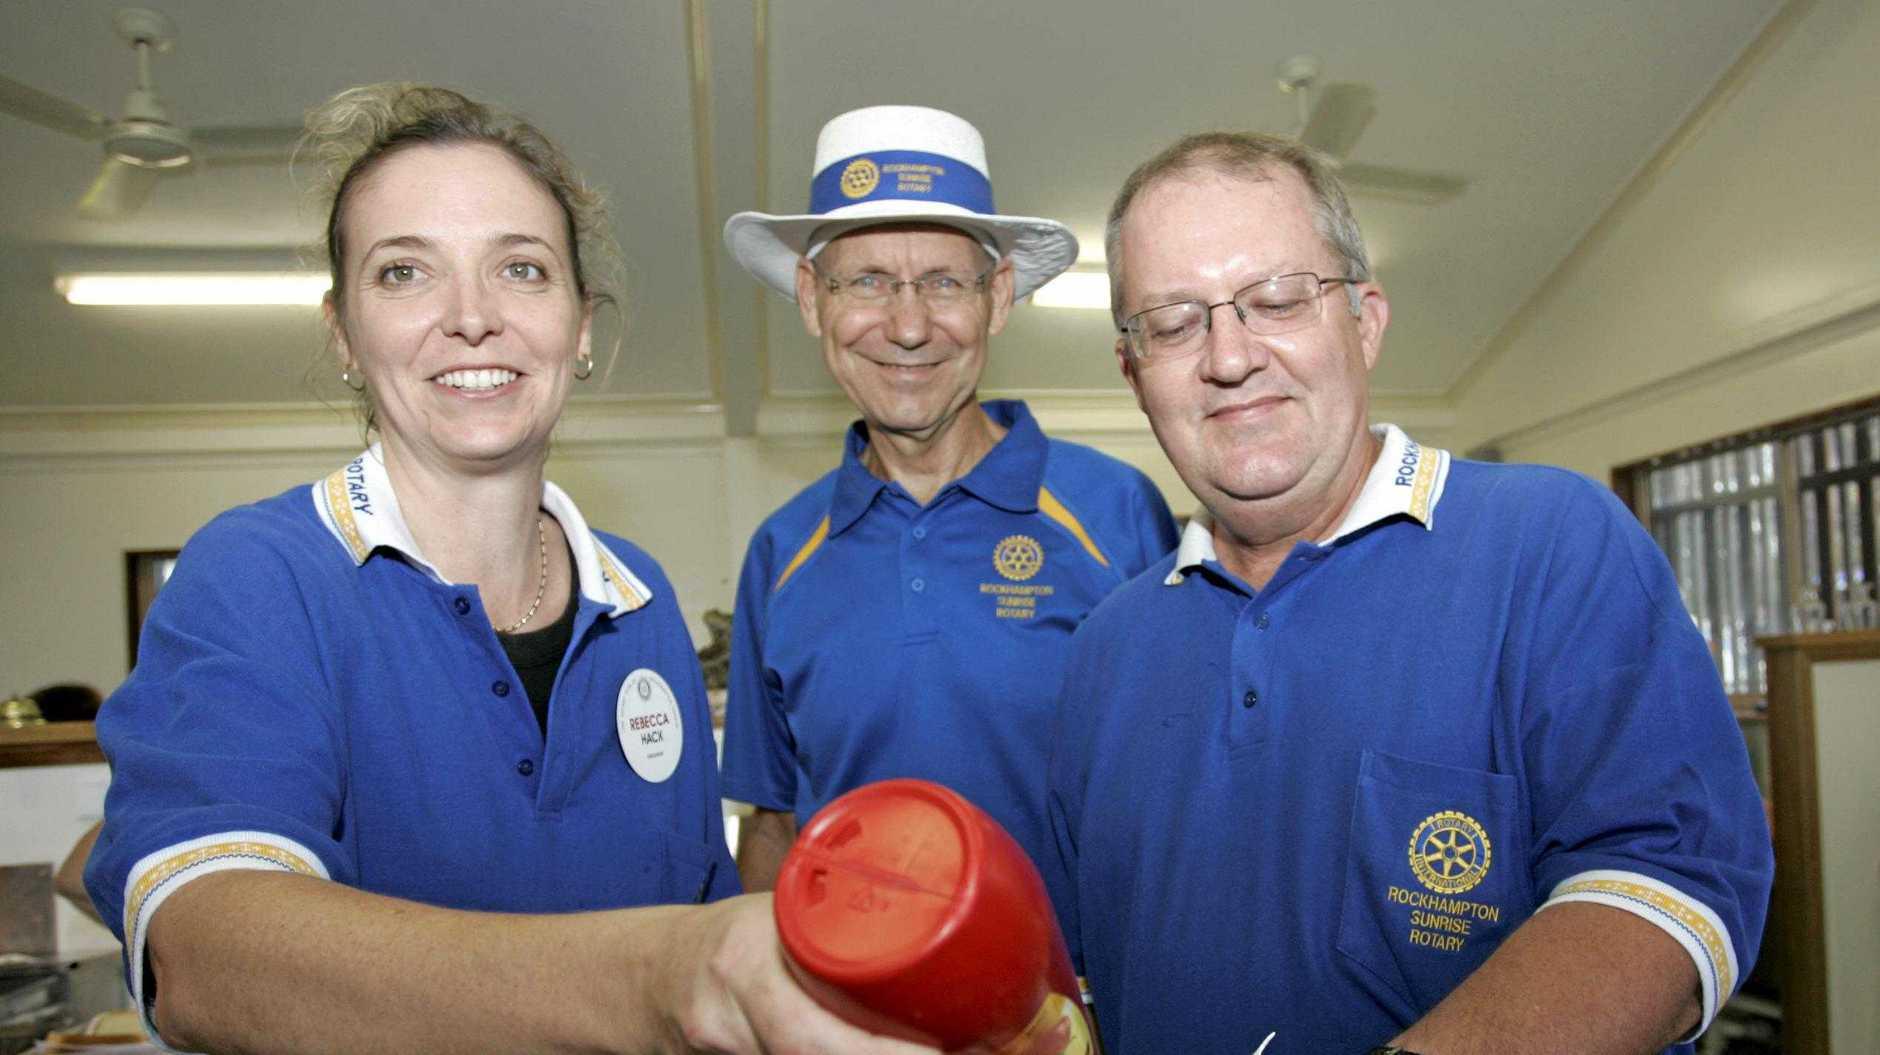 Rebecca Hack, Austin Grillmeier and Don Wilschefski. Bring Back the Sunshine Flood Appeal Charity Day on Mount Archer.